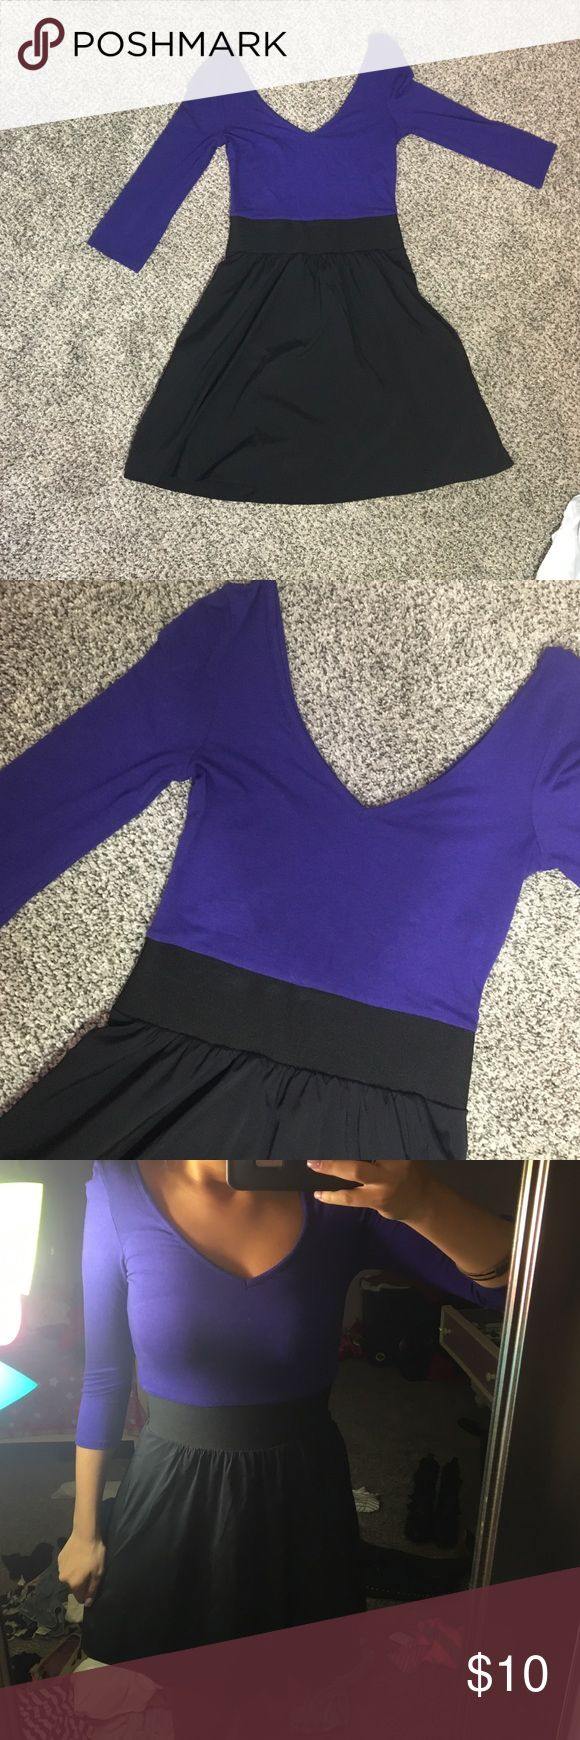 Purple and Black Dress Deep V-Neck Dress. Preloved but had wear left, Express Dresses Mini